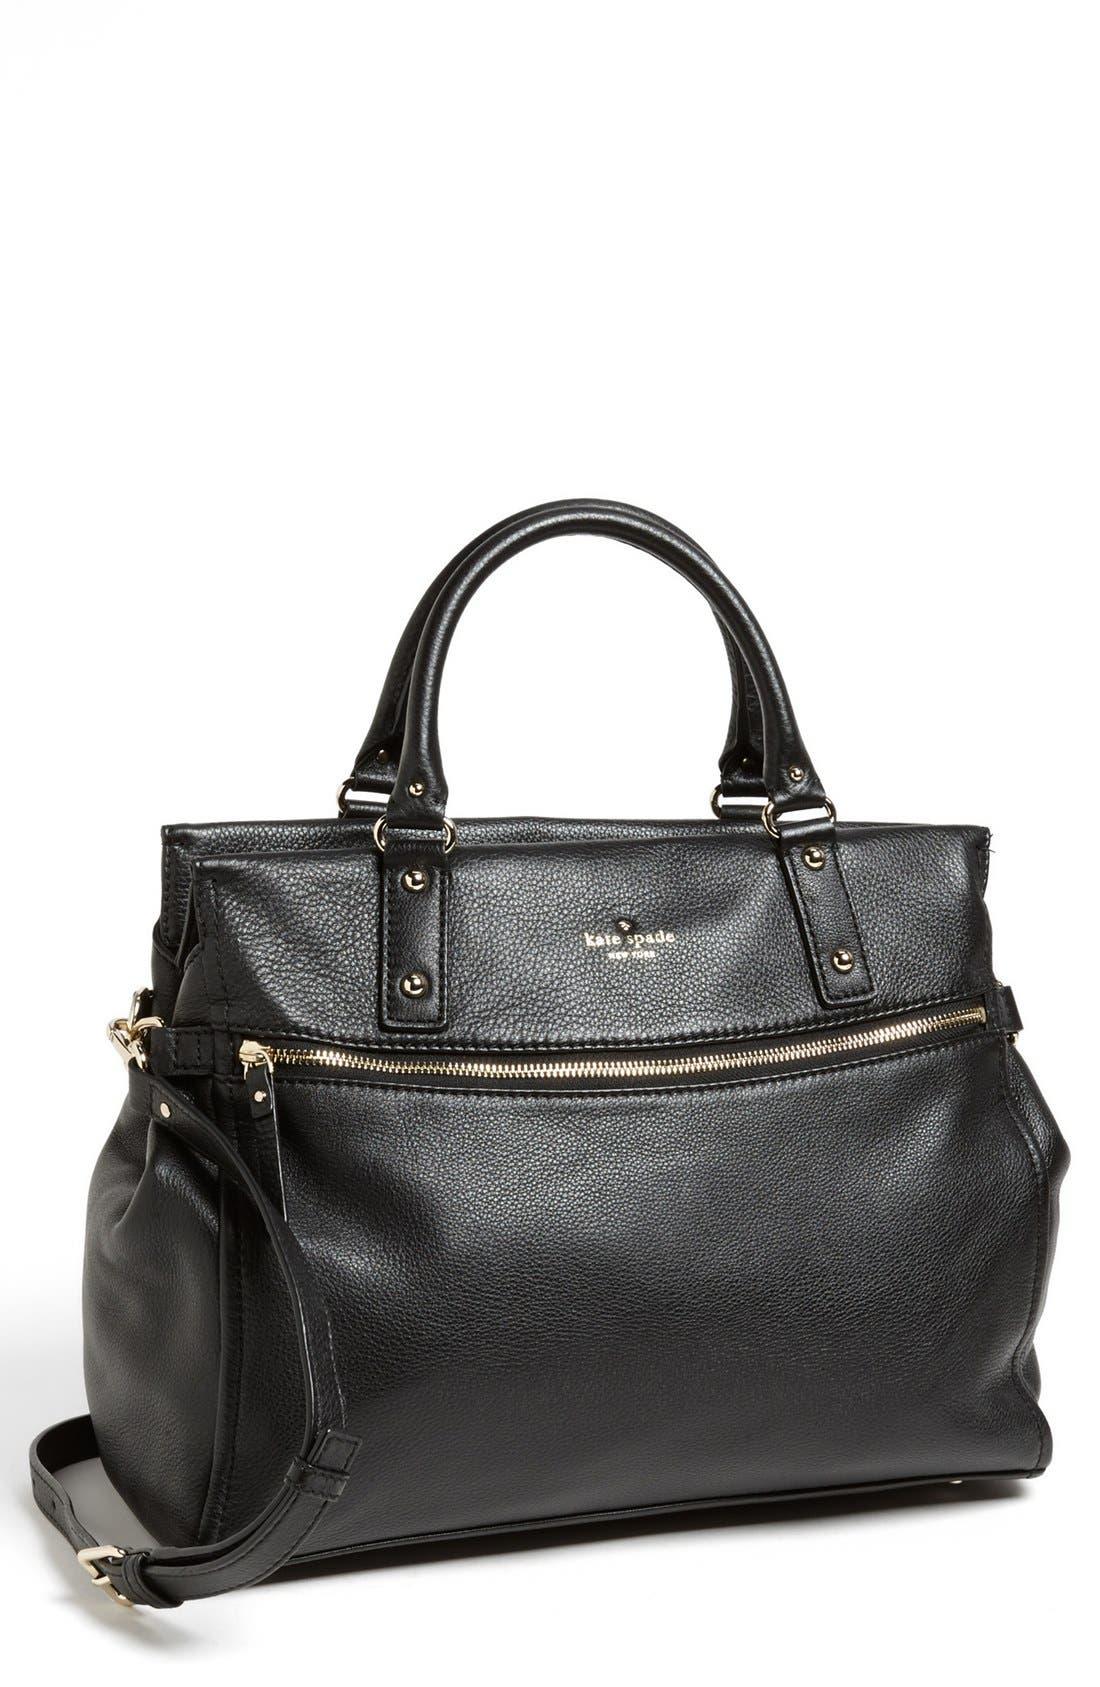 Main Image - kate spade new york 'cobble hill - murphy' crossbody bag